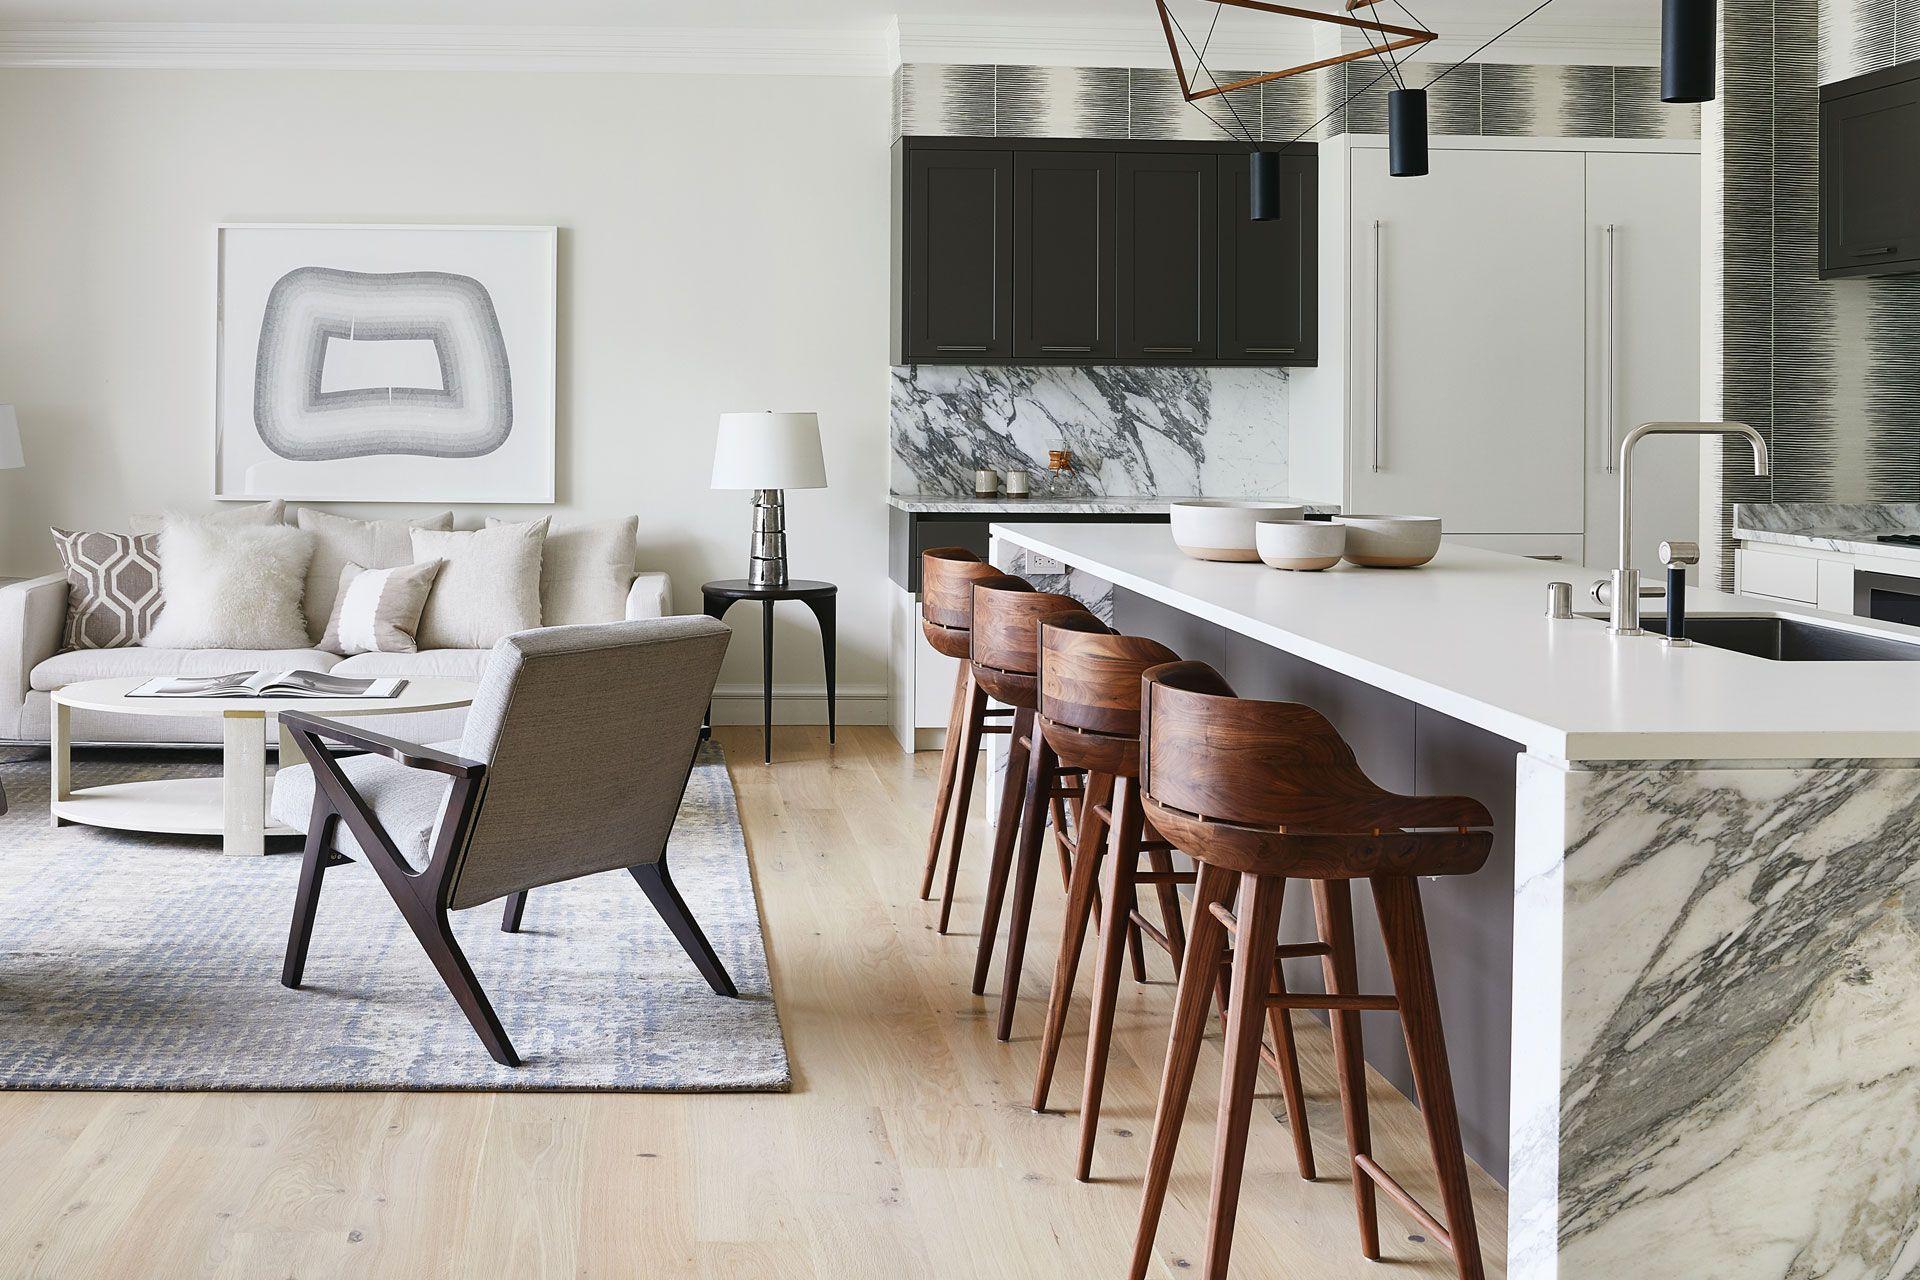 interior-design-san-francisco-decorating-design-firm-jeff-schlarb.jpg